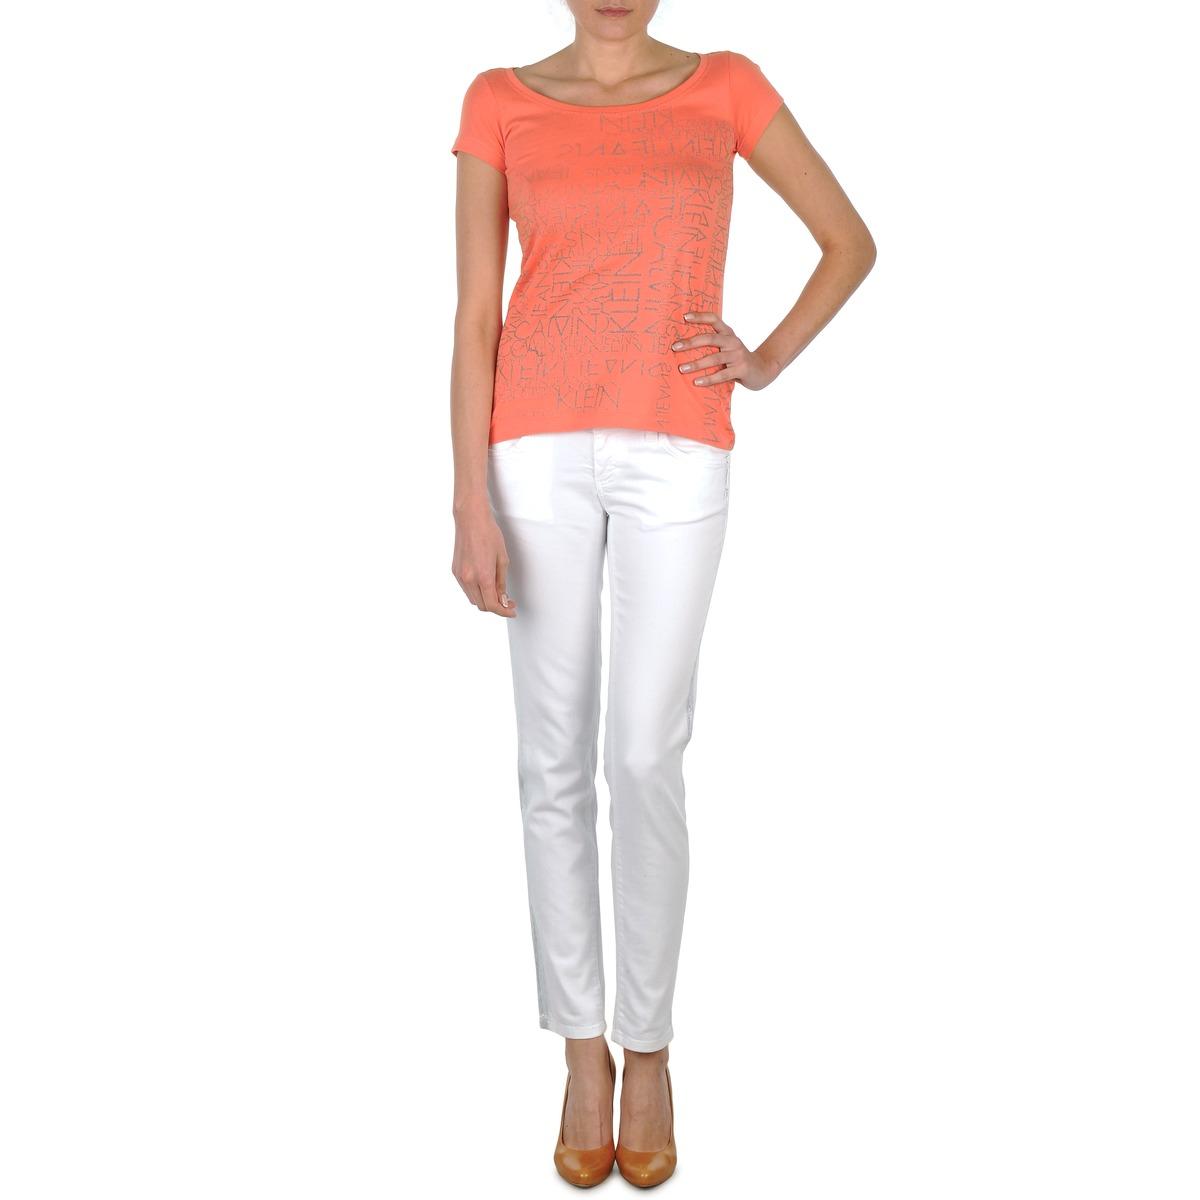 Calvin Klein Jeans JEAN BLANC BORDURE ARGENTEE Blanc